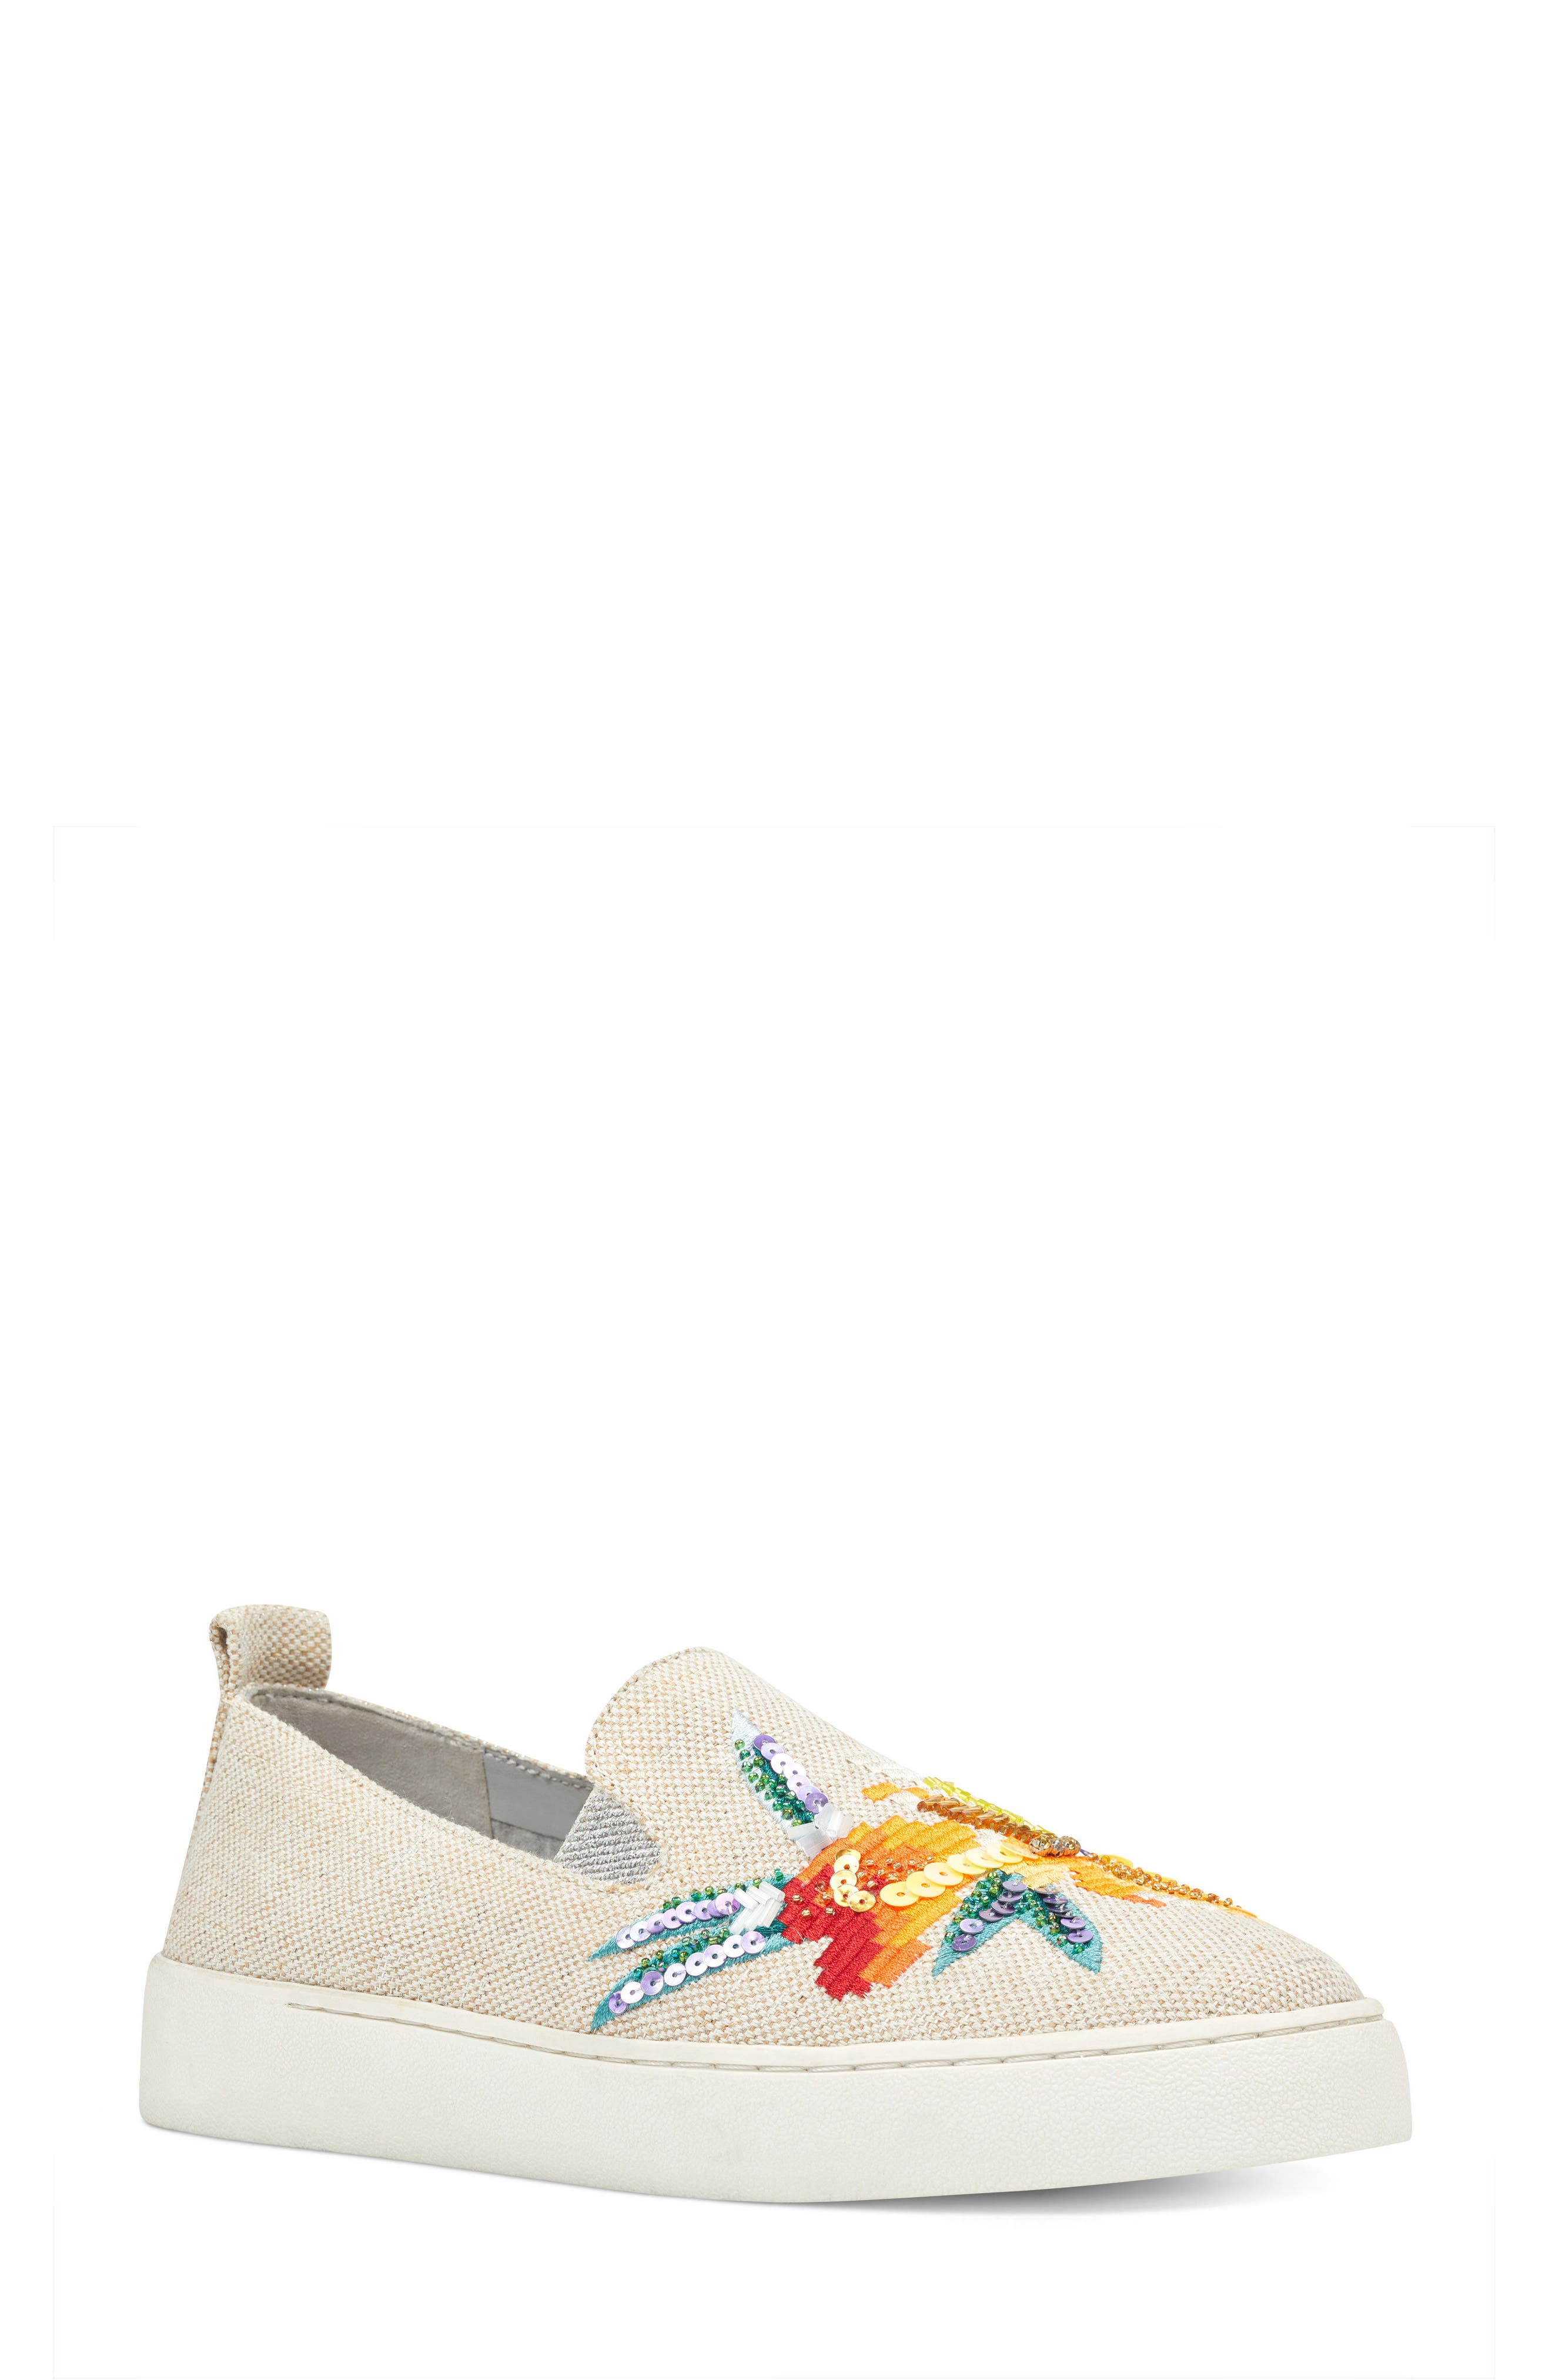 Playavista Slip-On Sneaker,                         Main,                         color, 270